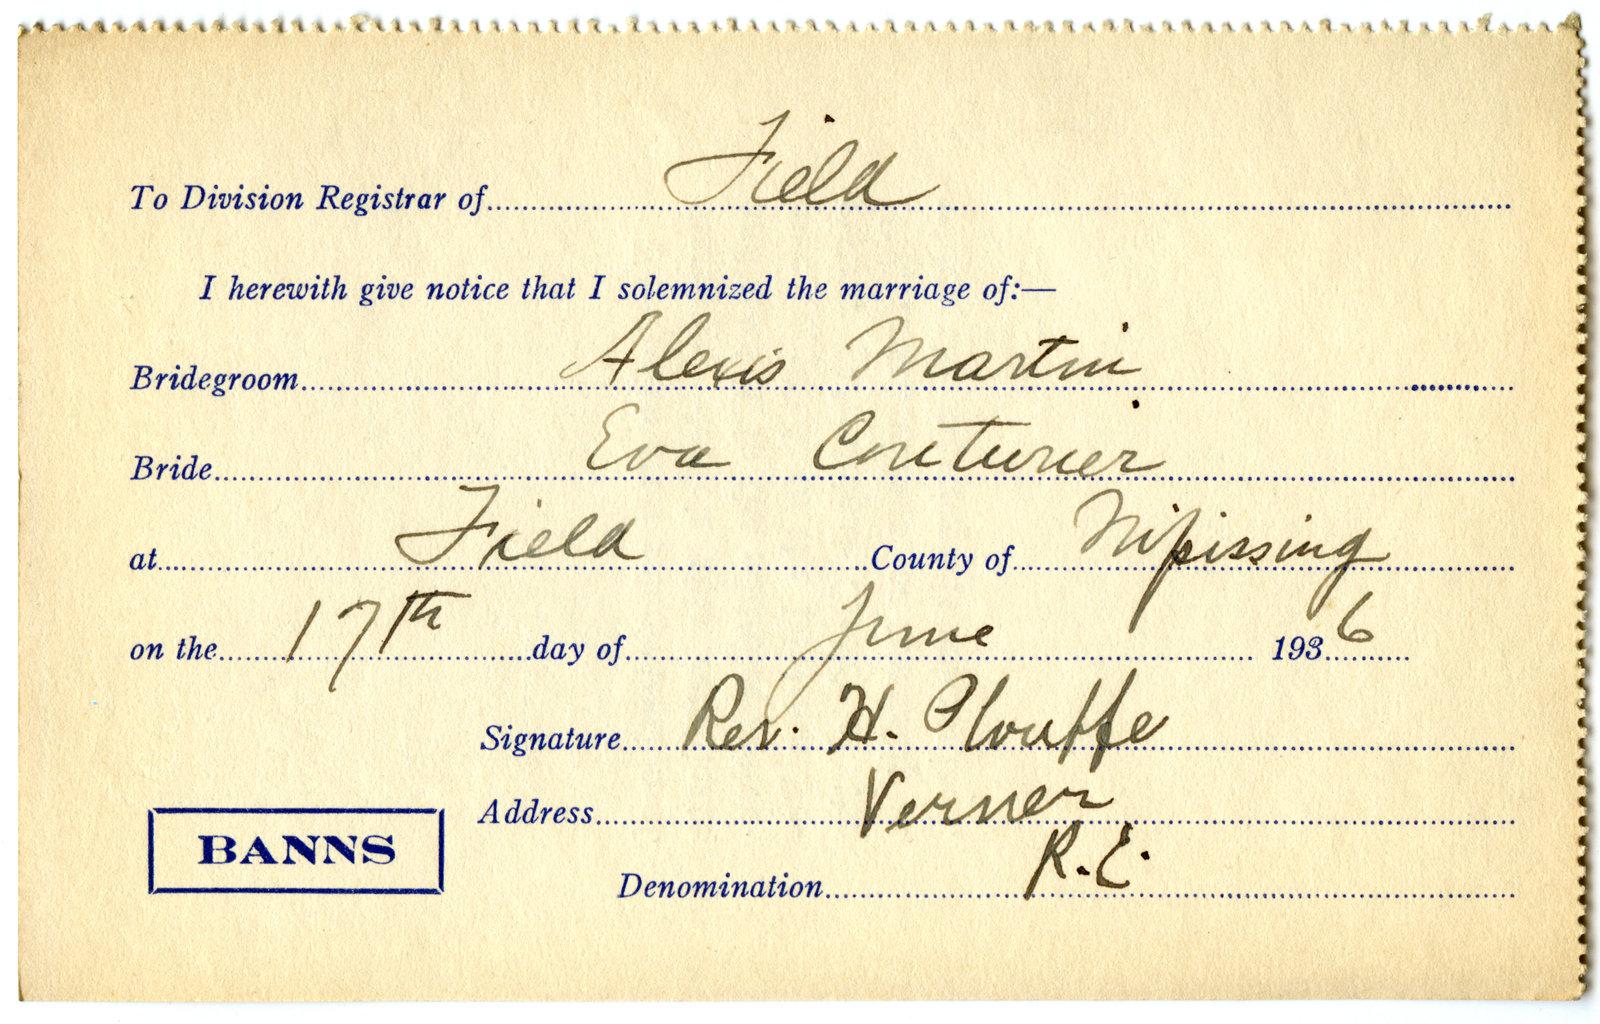 Certificat de mariage de / Marriage certificate of Alexis Martin & Eva Couturier